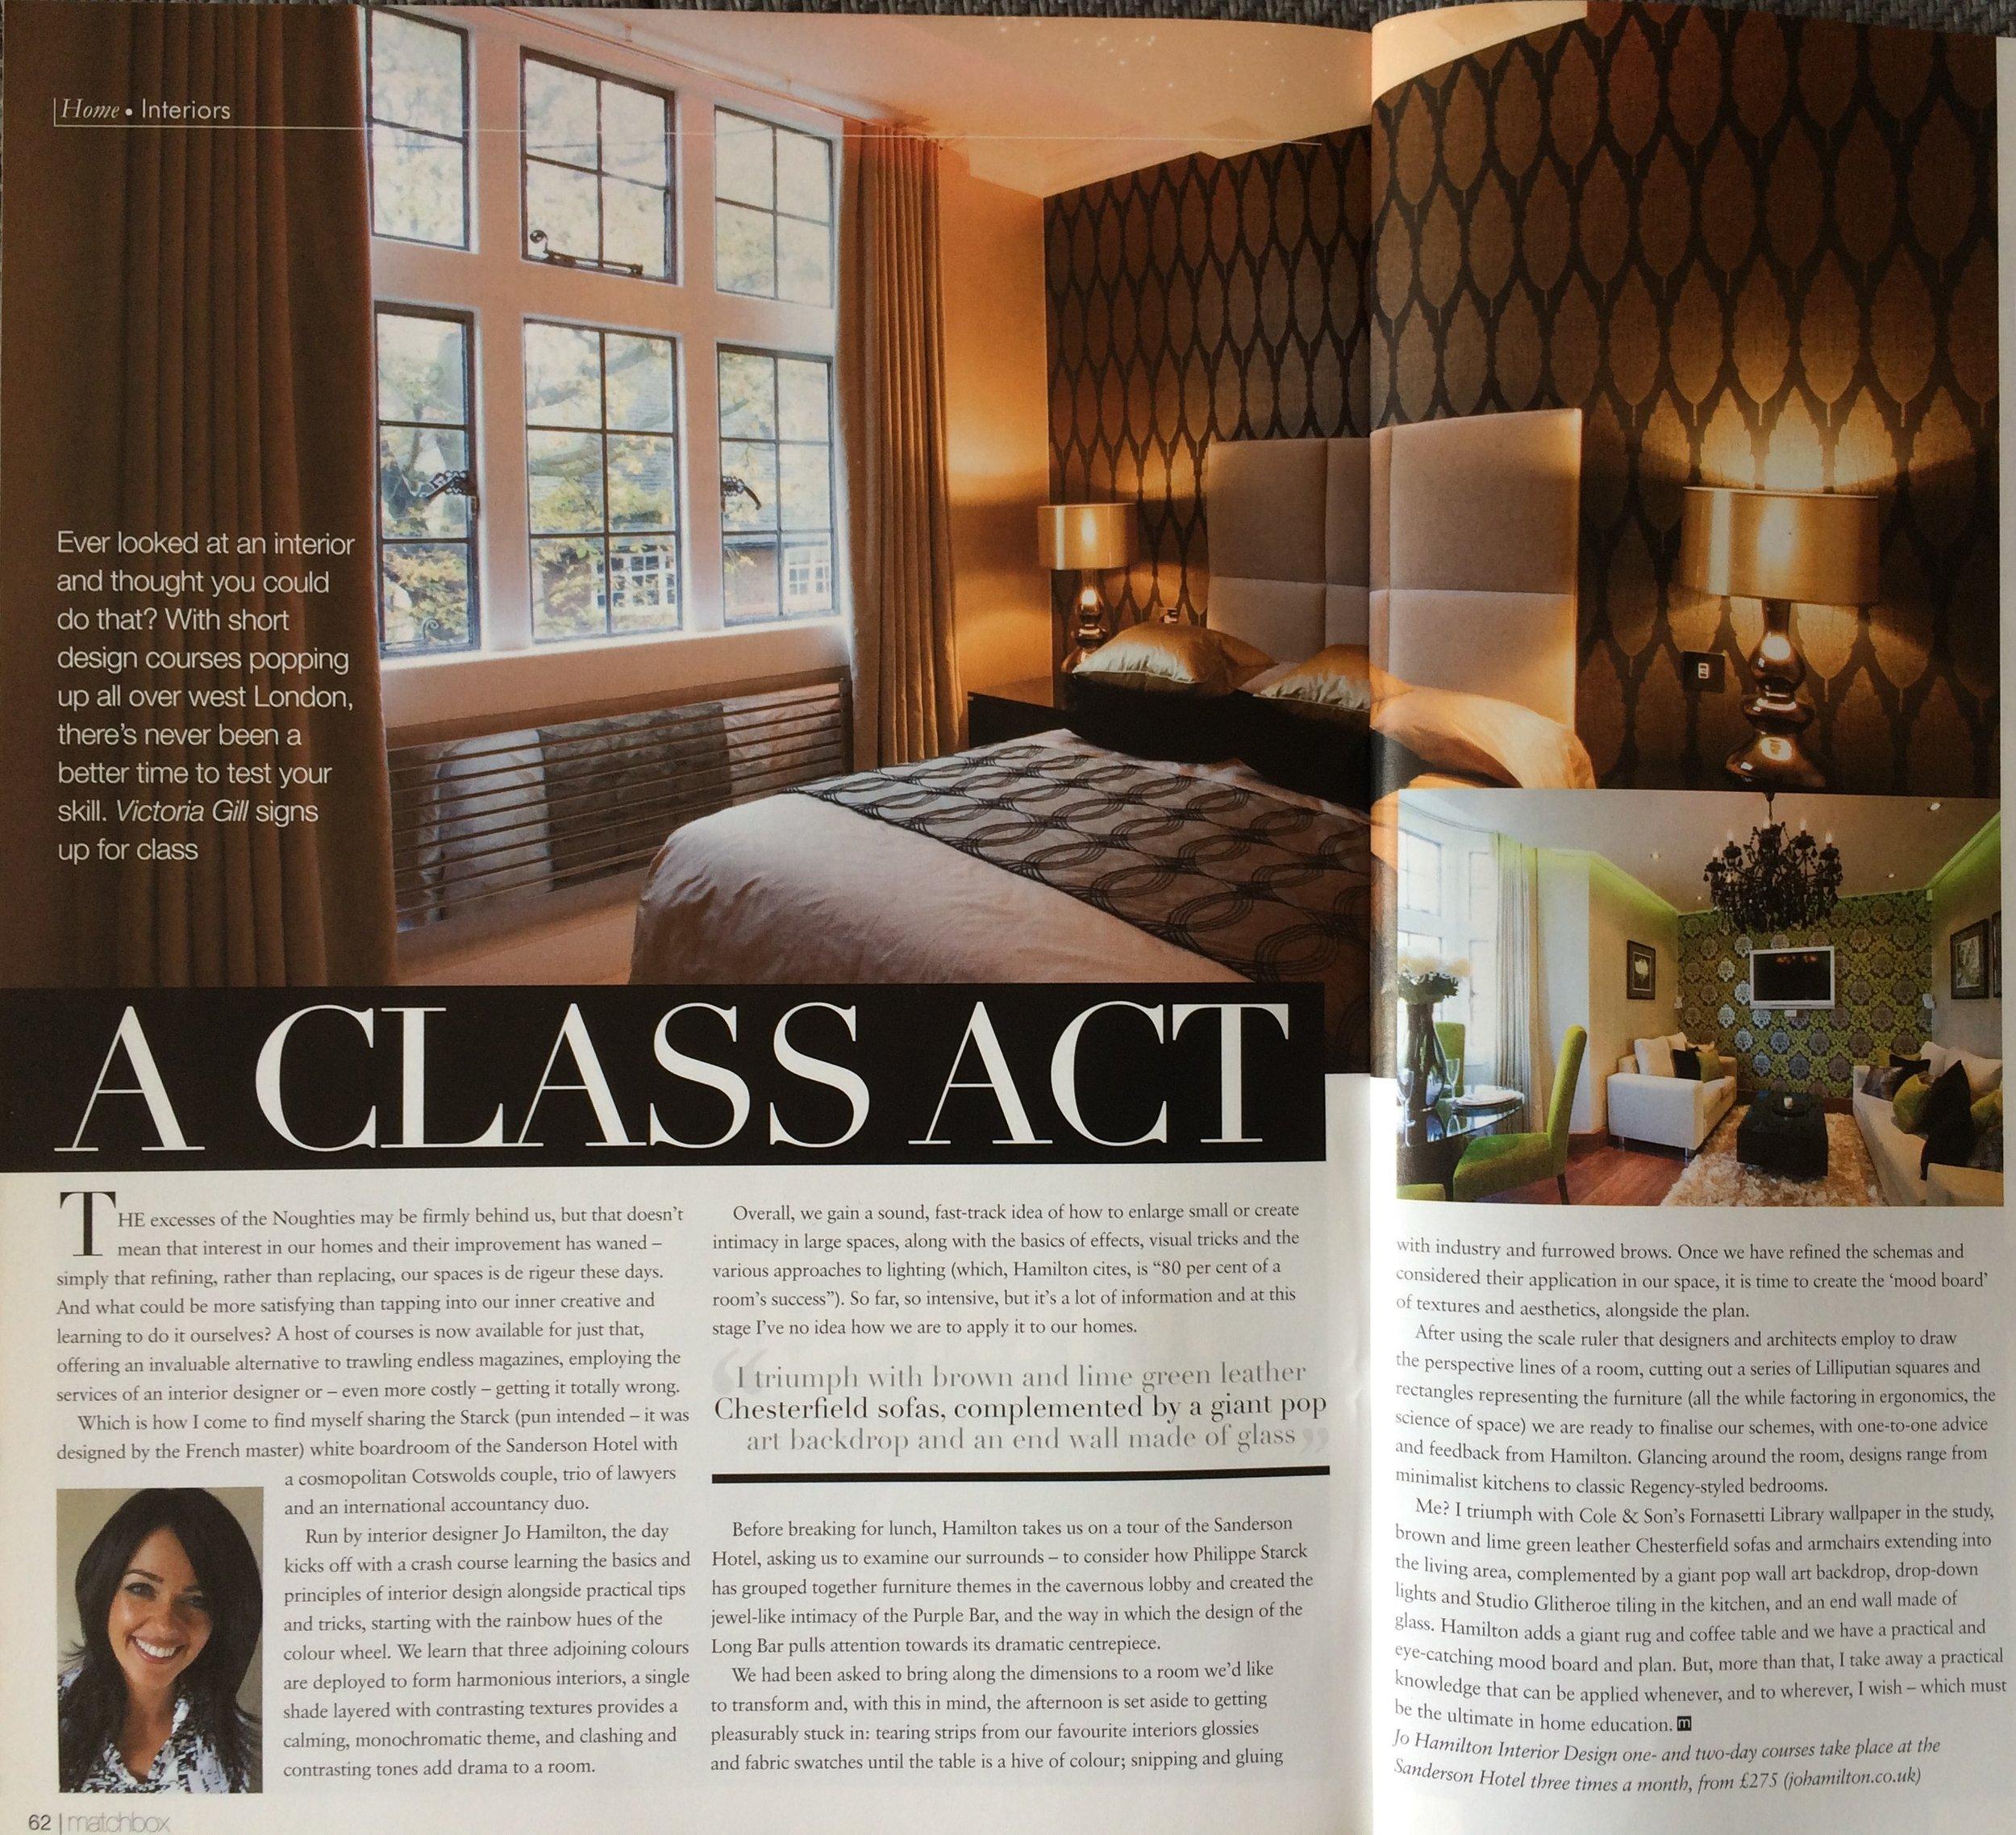 Luxury interior designer Jo Hamilton feature in Matchbox magazine. High-end London interior designer Jo Hamilton interview